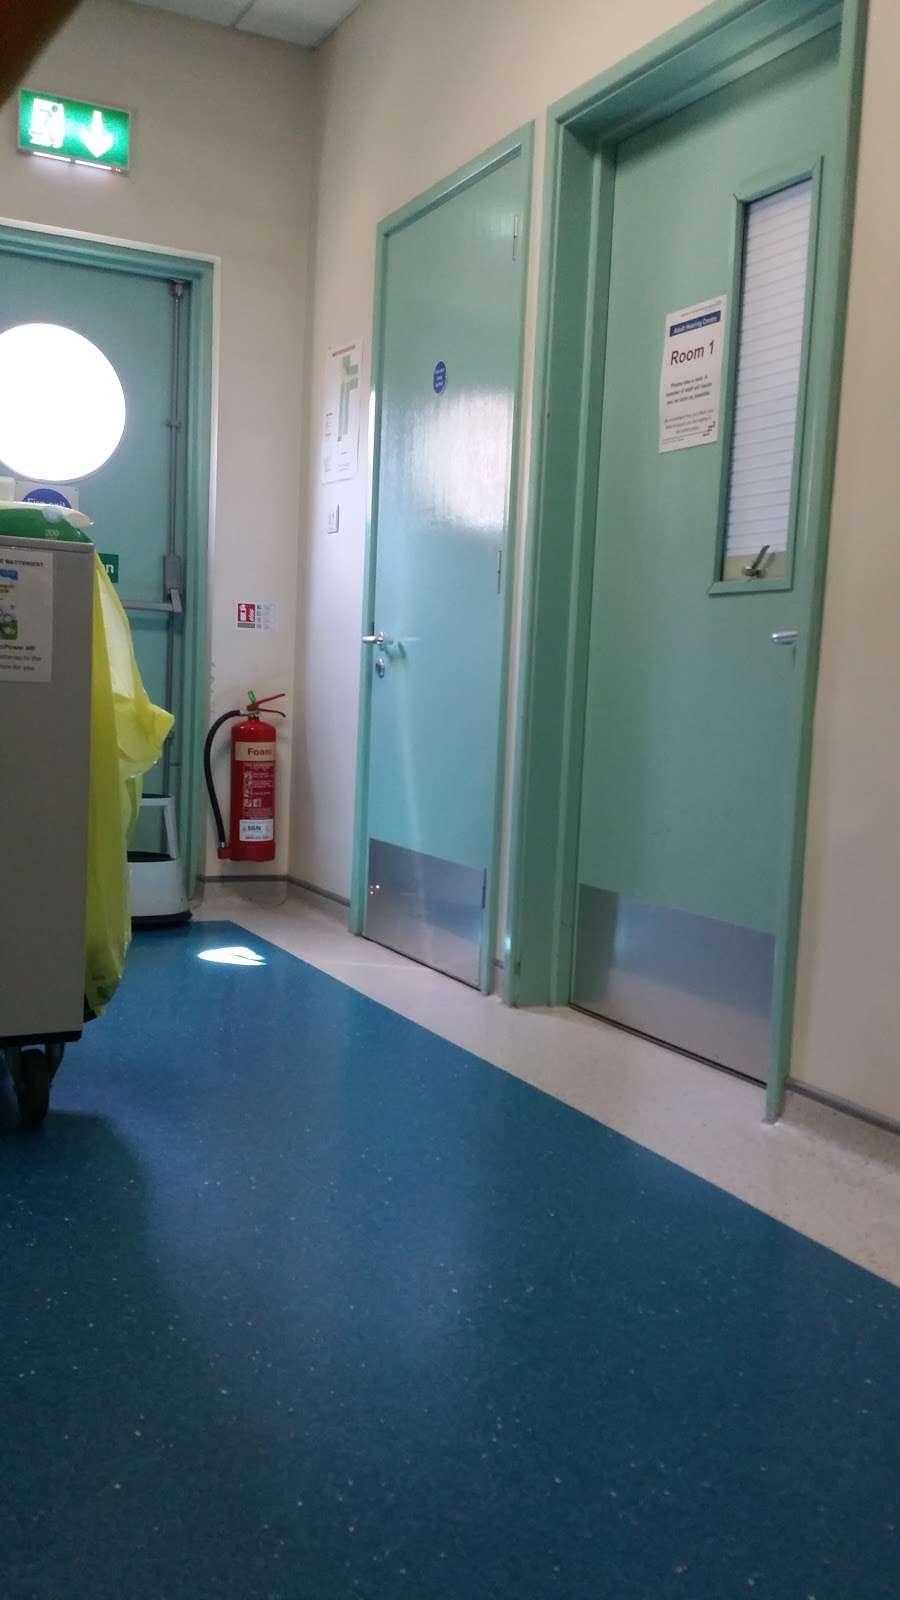 Orsett Hospital - hospital  | Photo 5 of 6 | Address: Rowley Rd, Orsett, Grays RM16 3EU, UK | Phone: 01268 524900